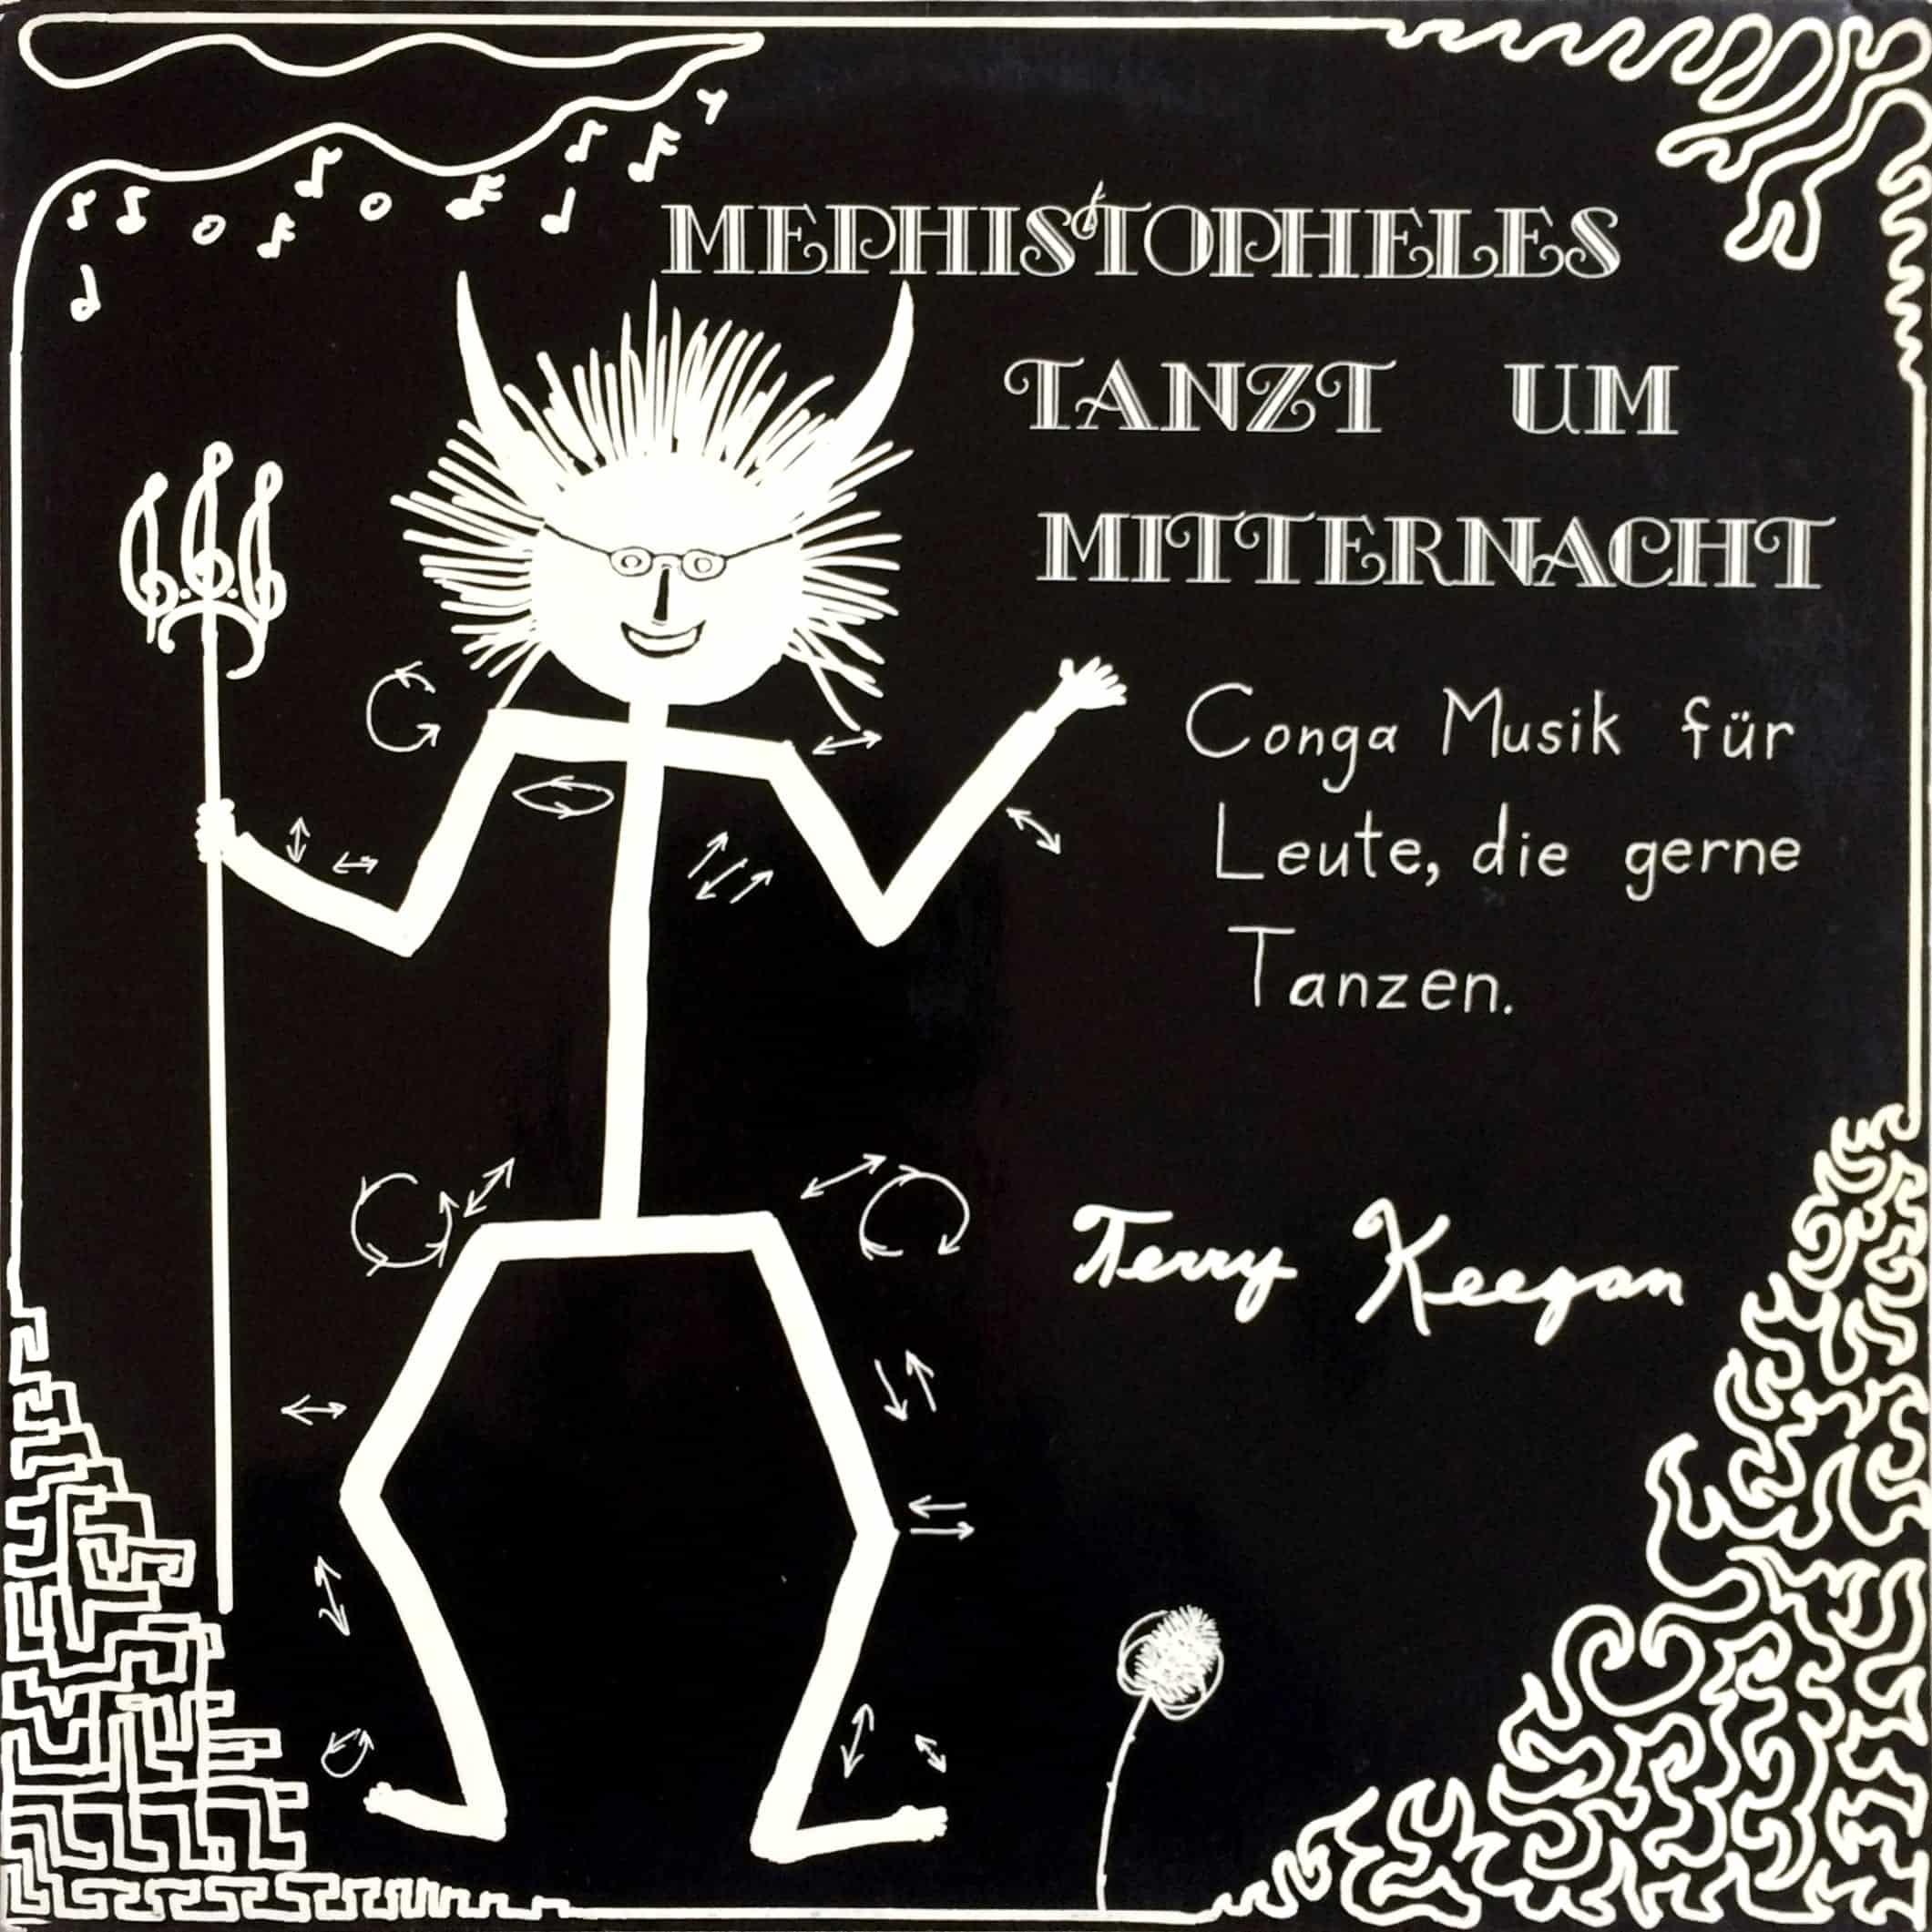 Terry Keegan – MEPHISTOPHELES TANZT UM MITTERNACHT